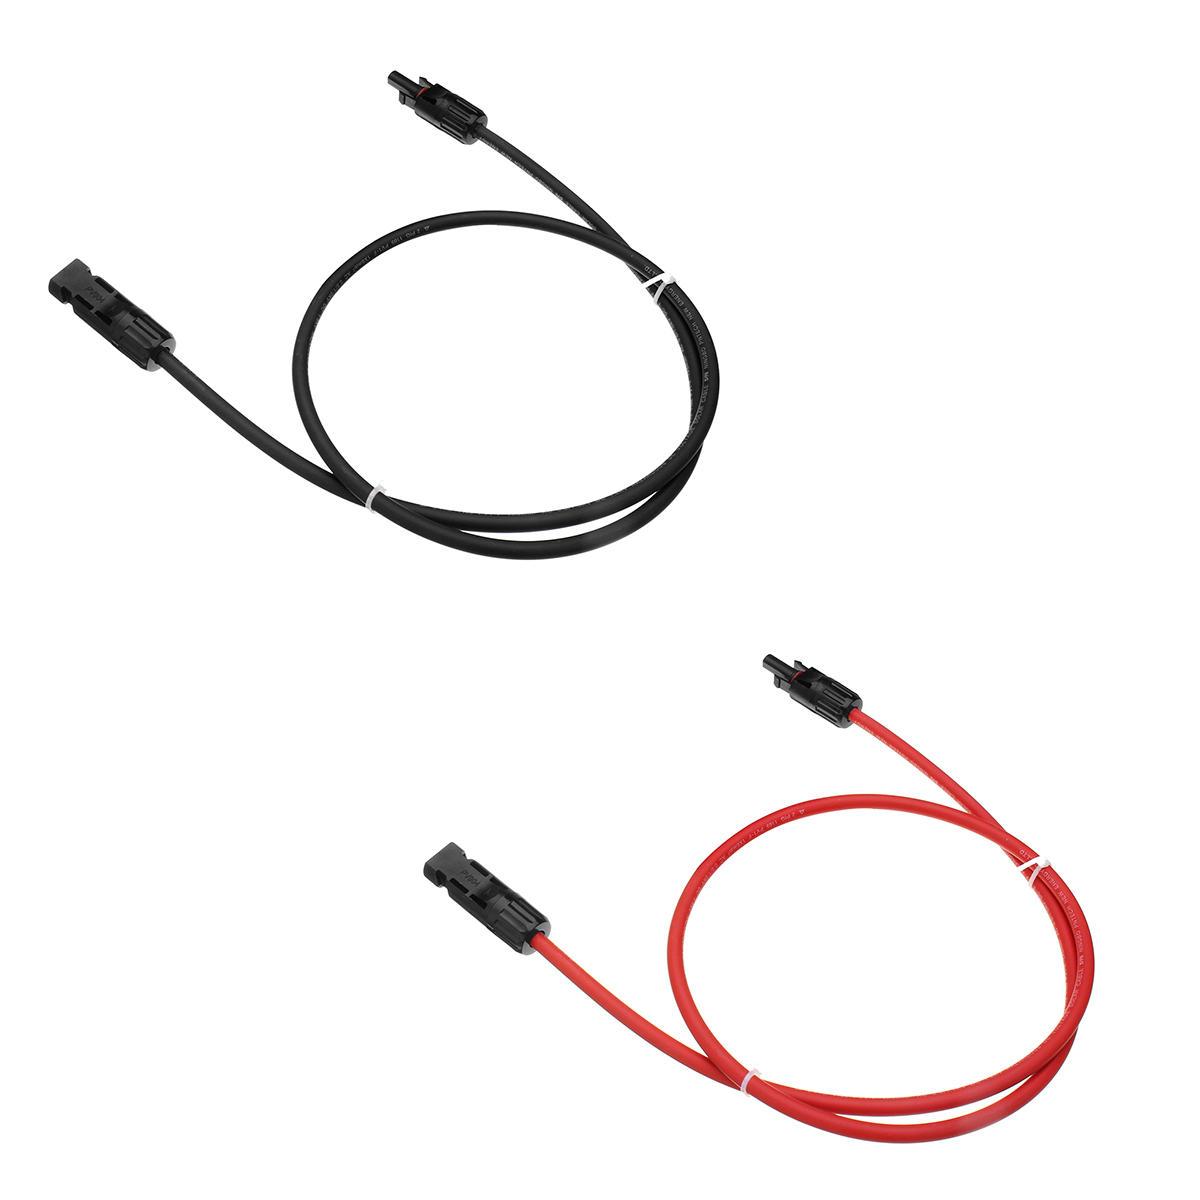 1m Awg10 Zwarte Of Rode Mc4 Connector Zonnepaneel